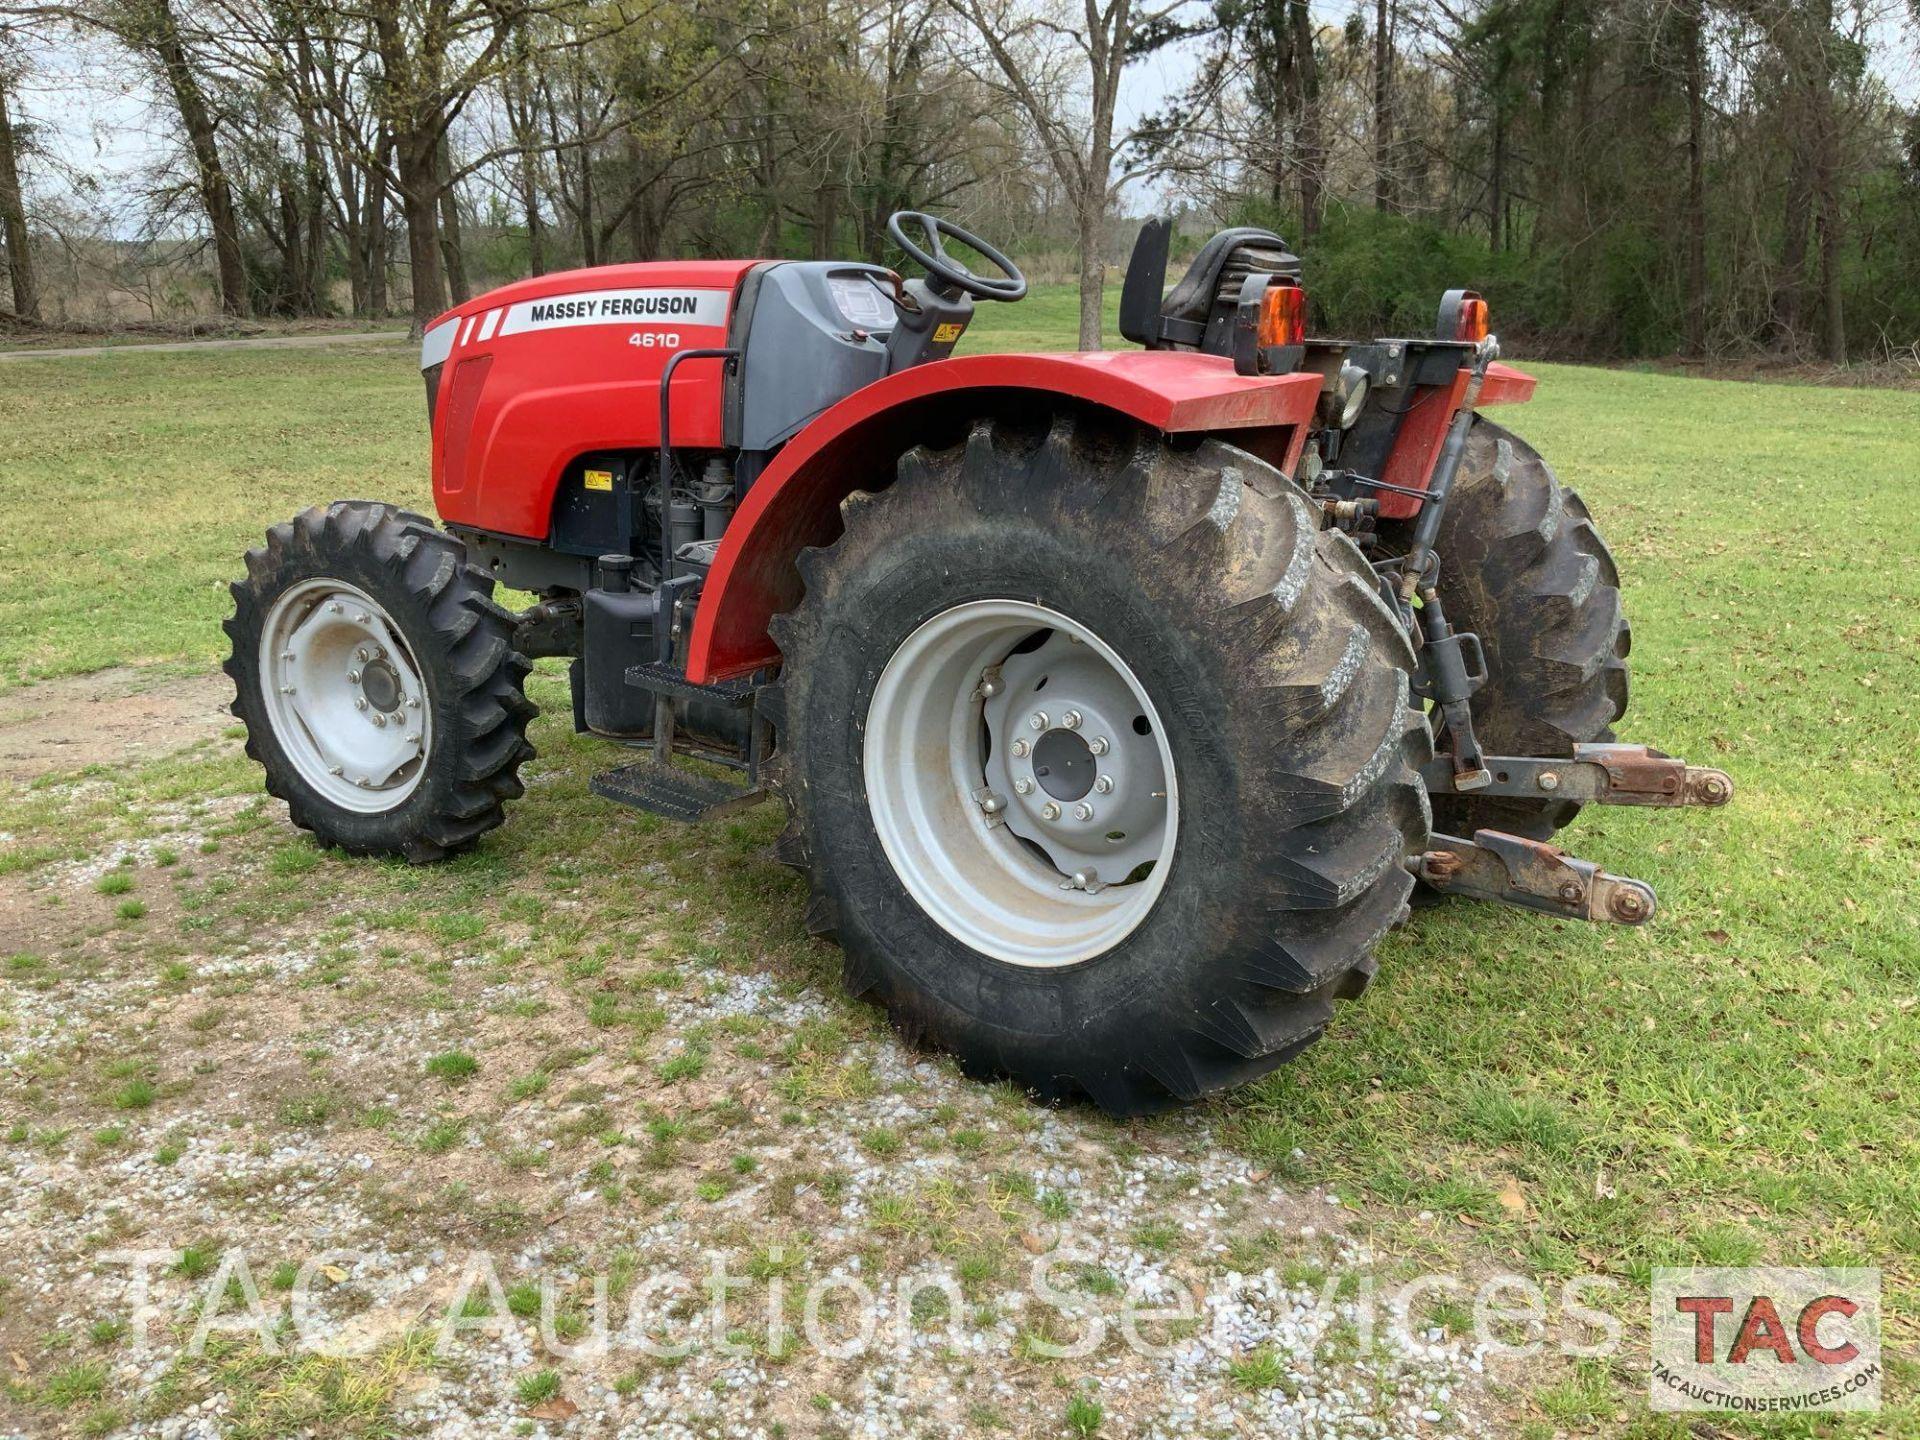 Massey-Ferguson 4610LP Farm Tractor - Image 4 of 26